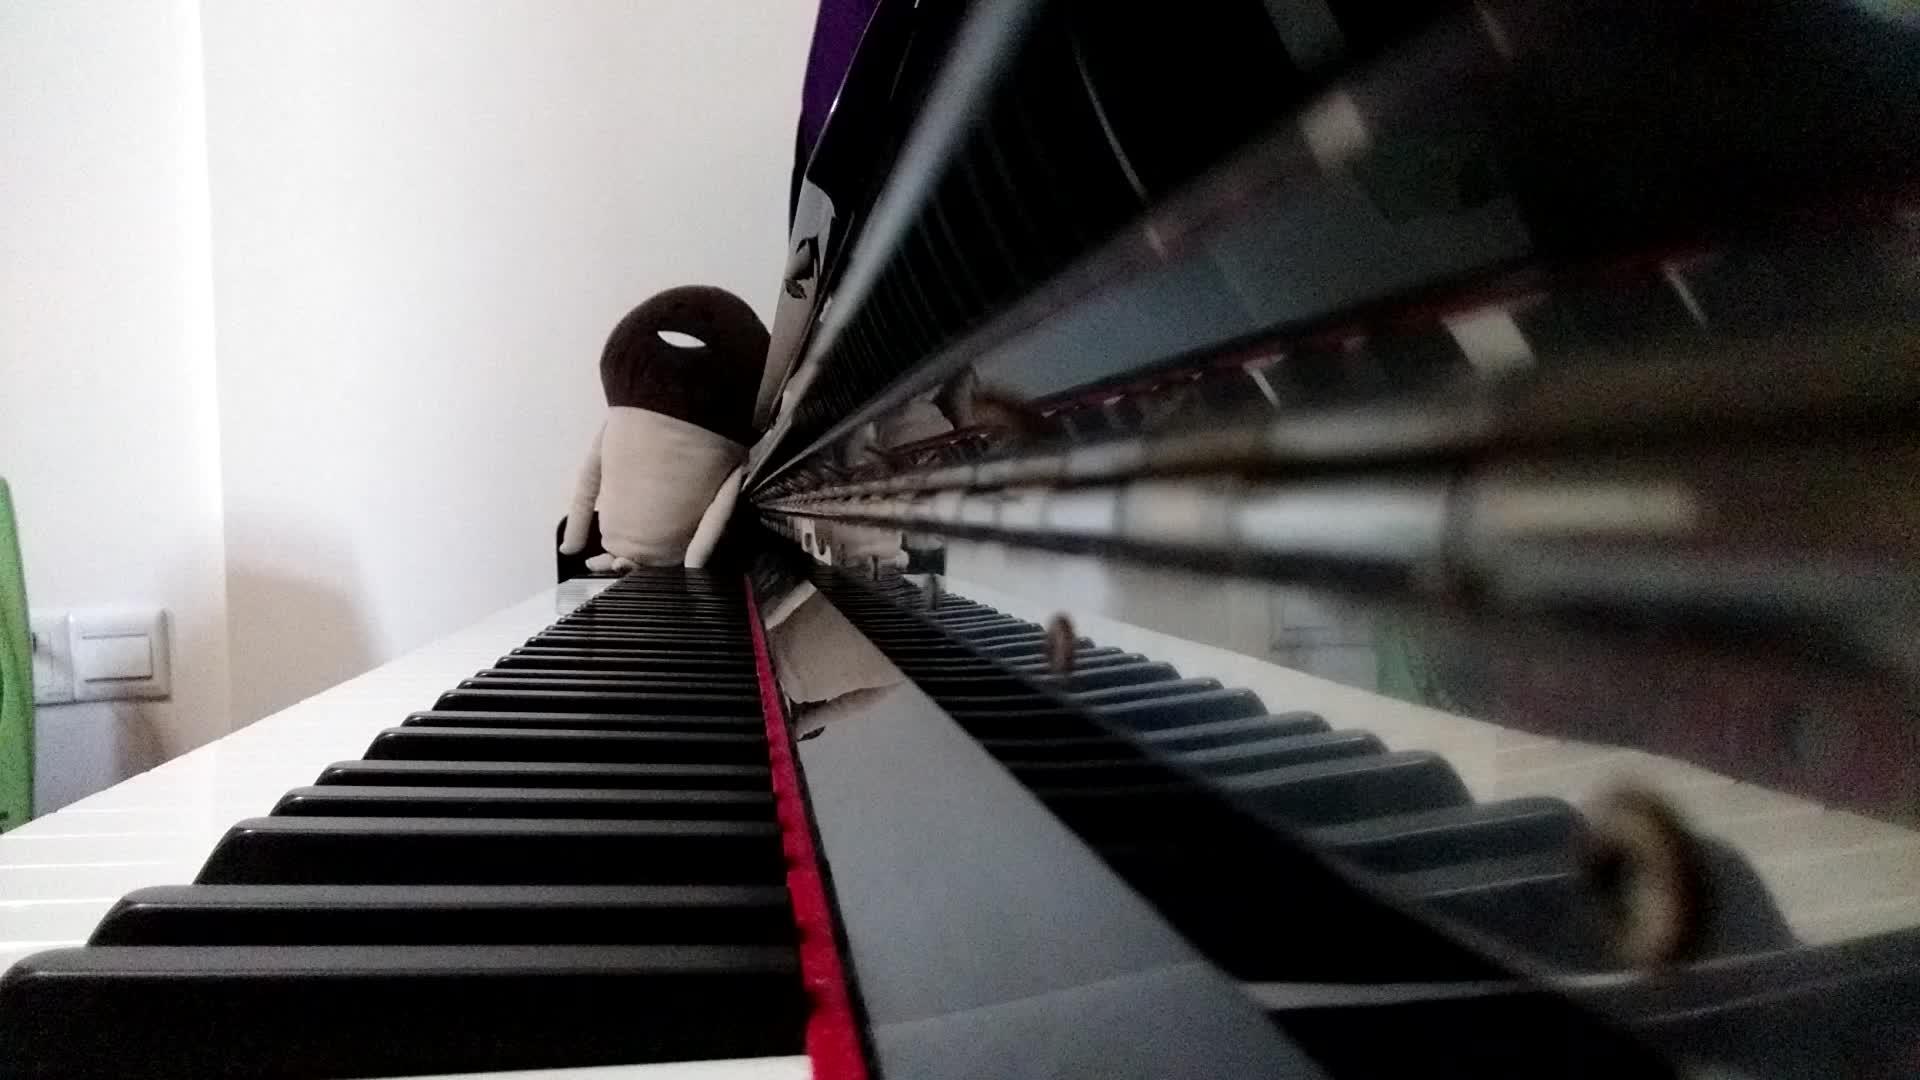 漆黑的子弹op_【钢琴】漆黑的子弹OP Black Bullet_哔哩哔哩 (゜-゜)つロ 干杯~-bilibili